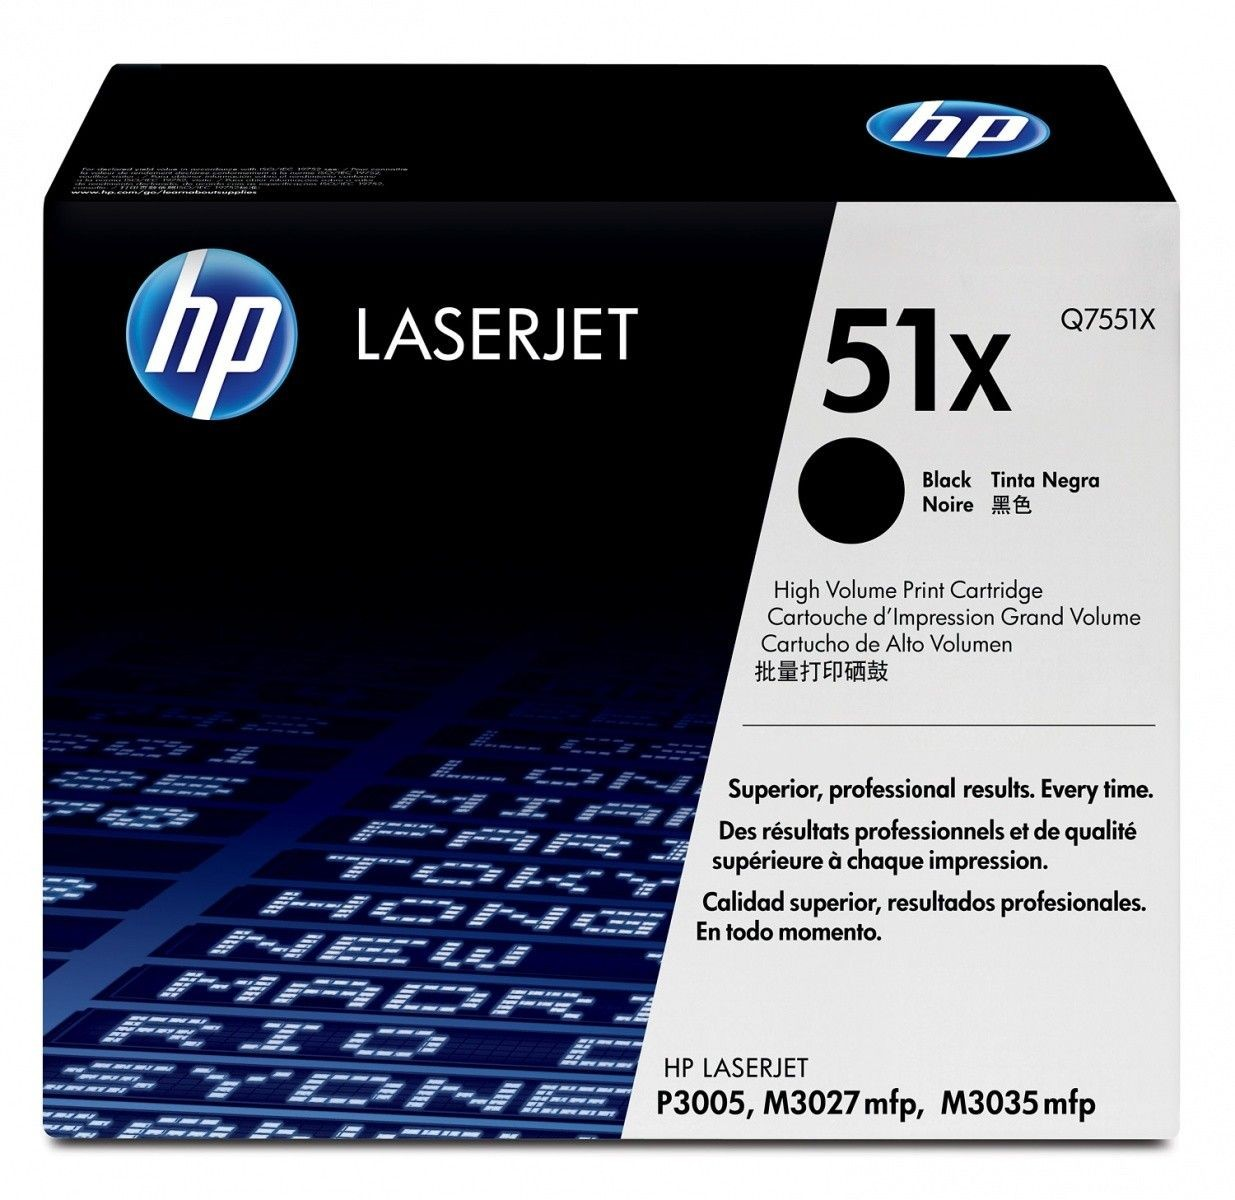 HP Toner HP black | 13000str | LJP3005/M3035MFP/M3027MFP